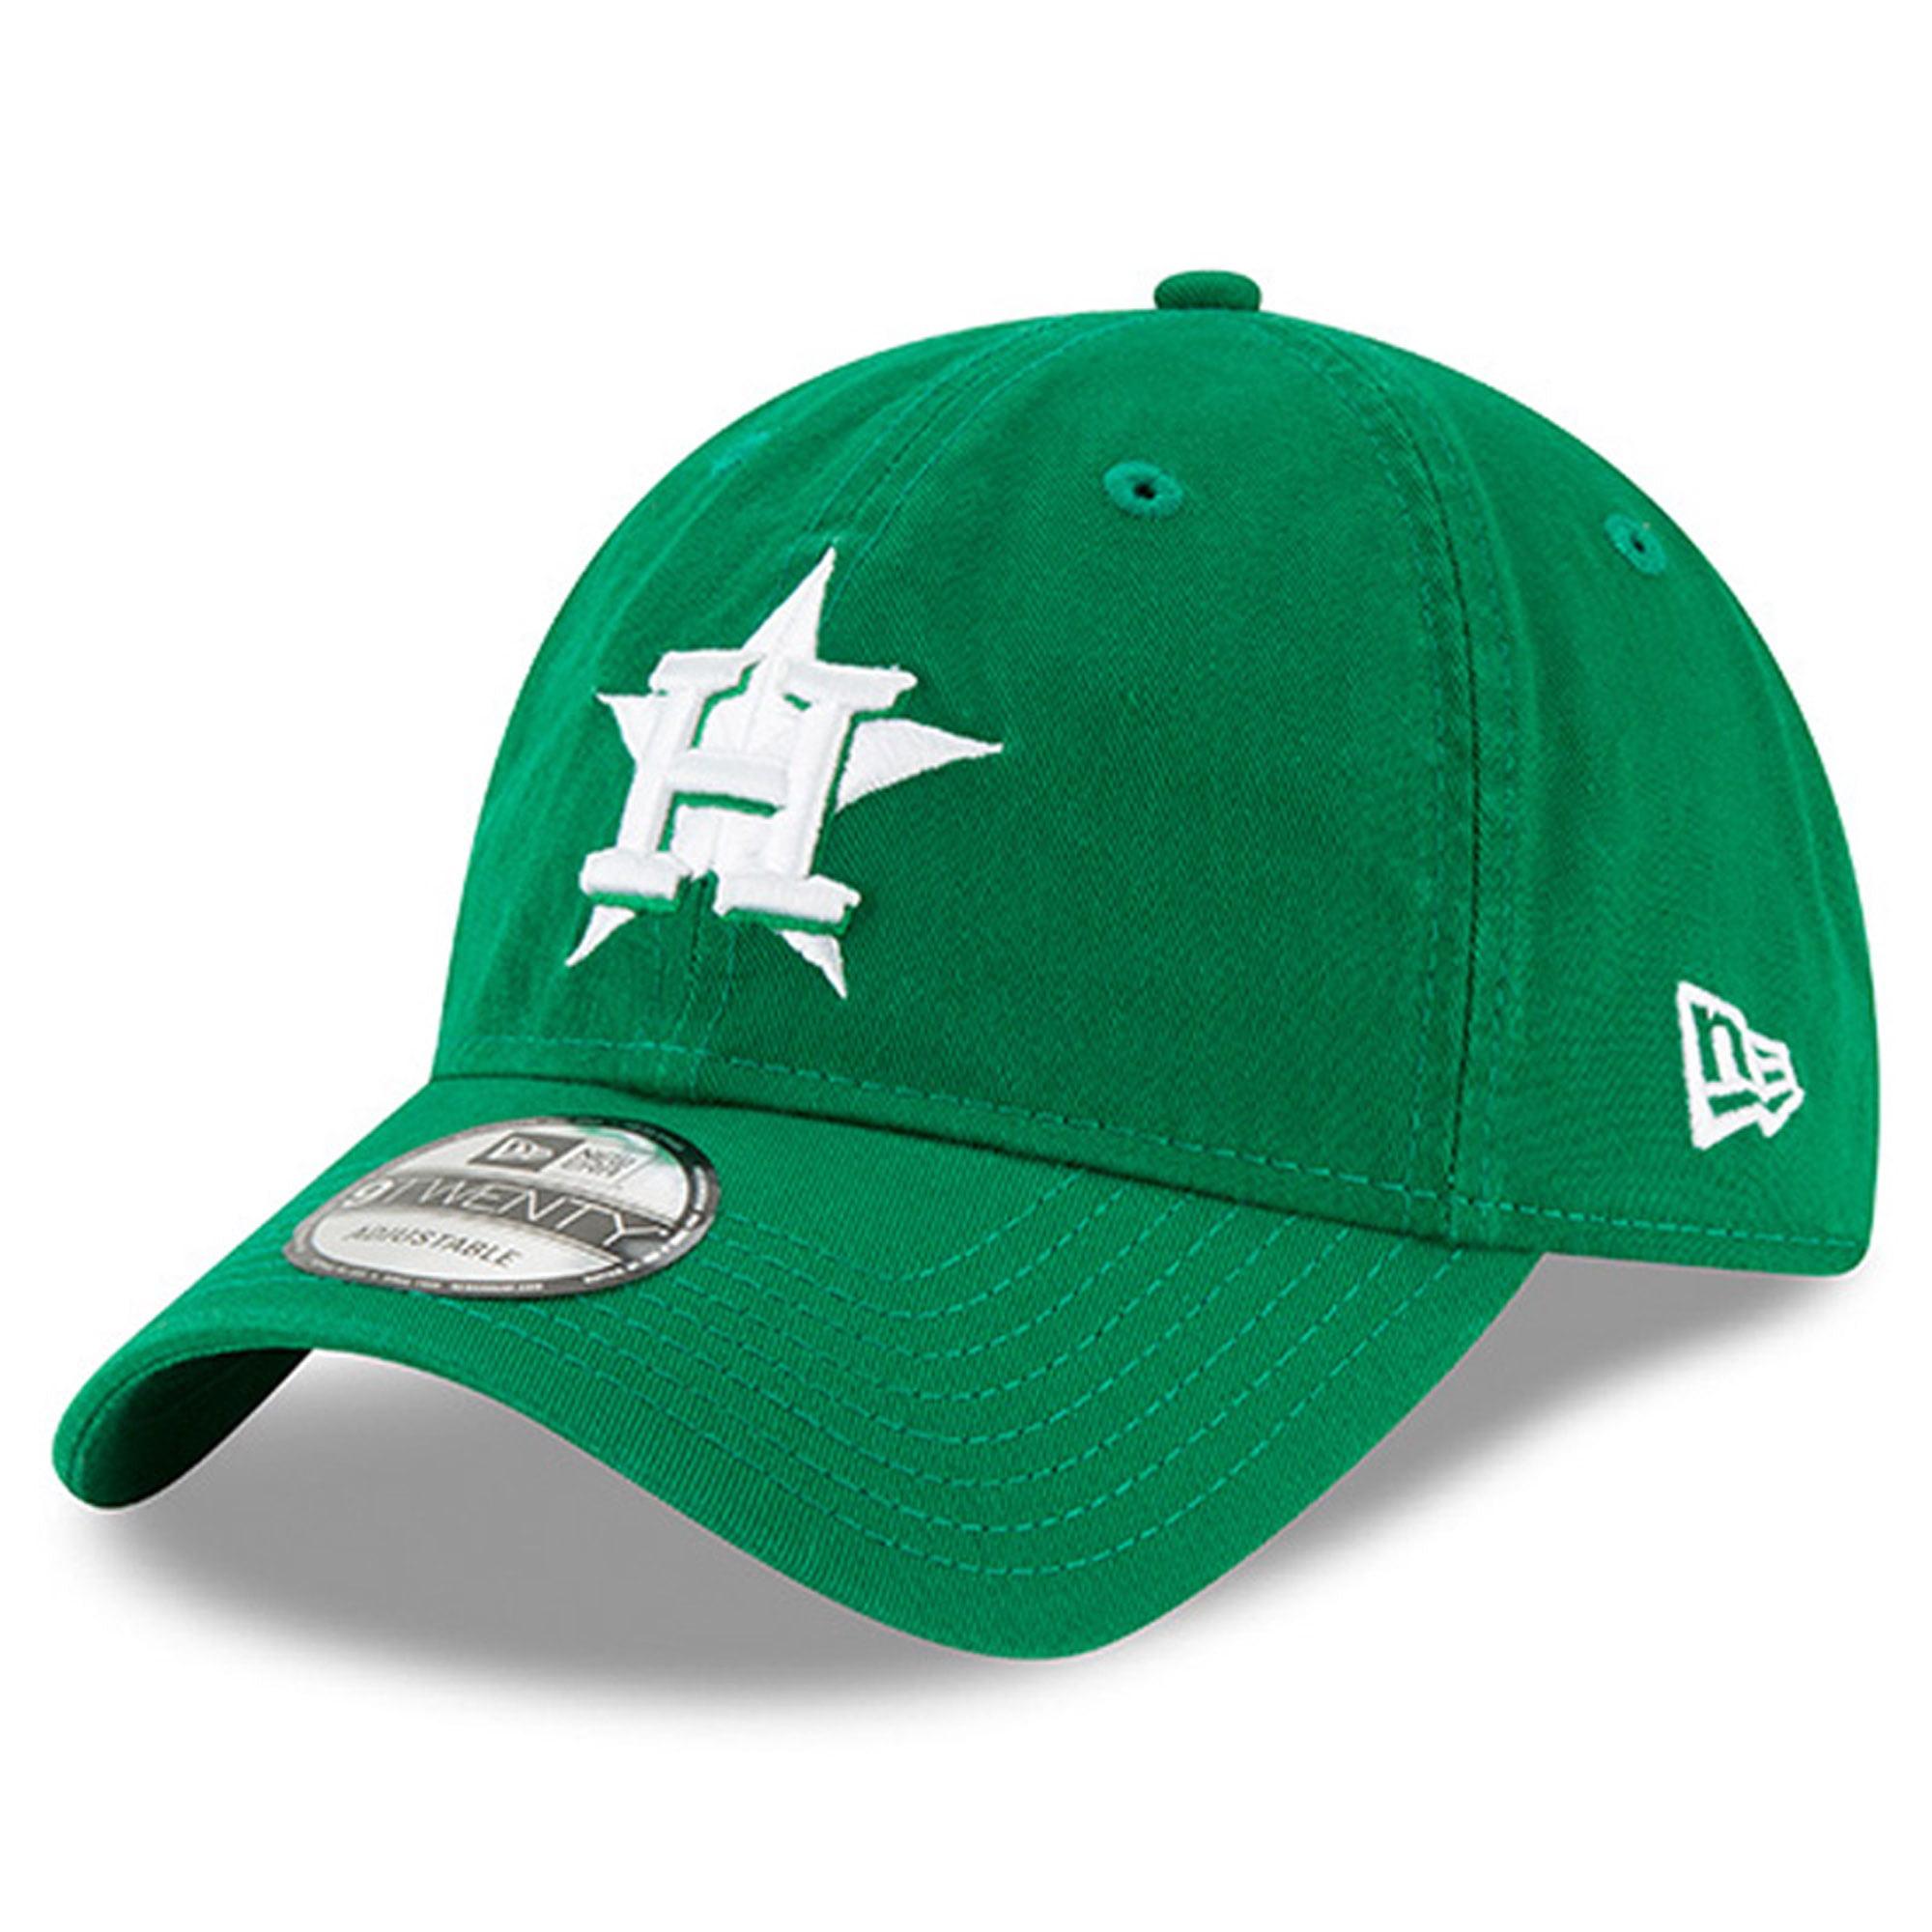 Houston Astros New Era Women's 2018 St. Patrick's Day Prolight 9TWENTY Adjustable Hat - Green - OSFA